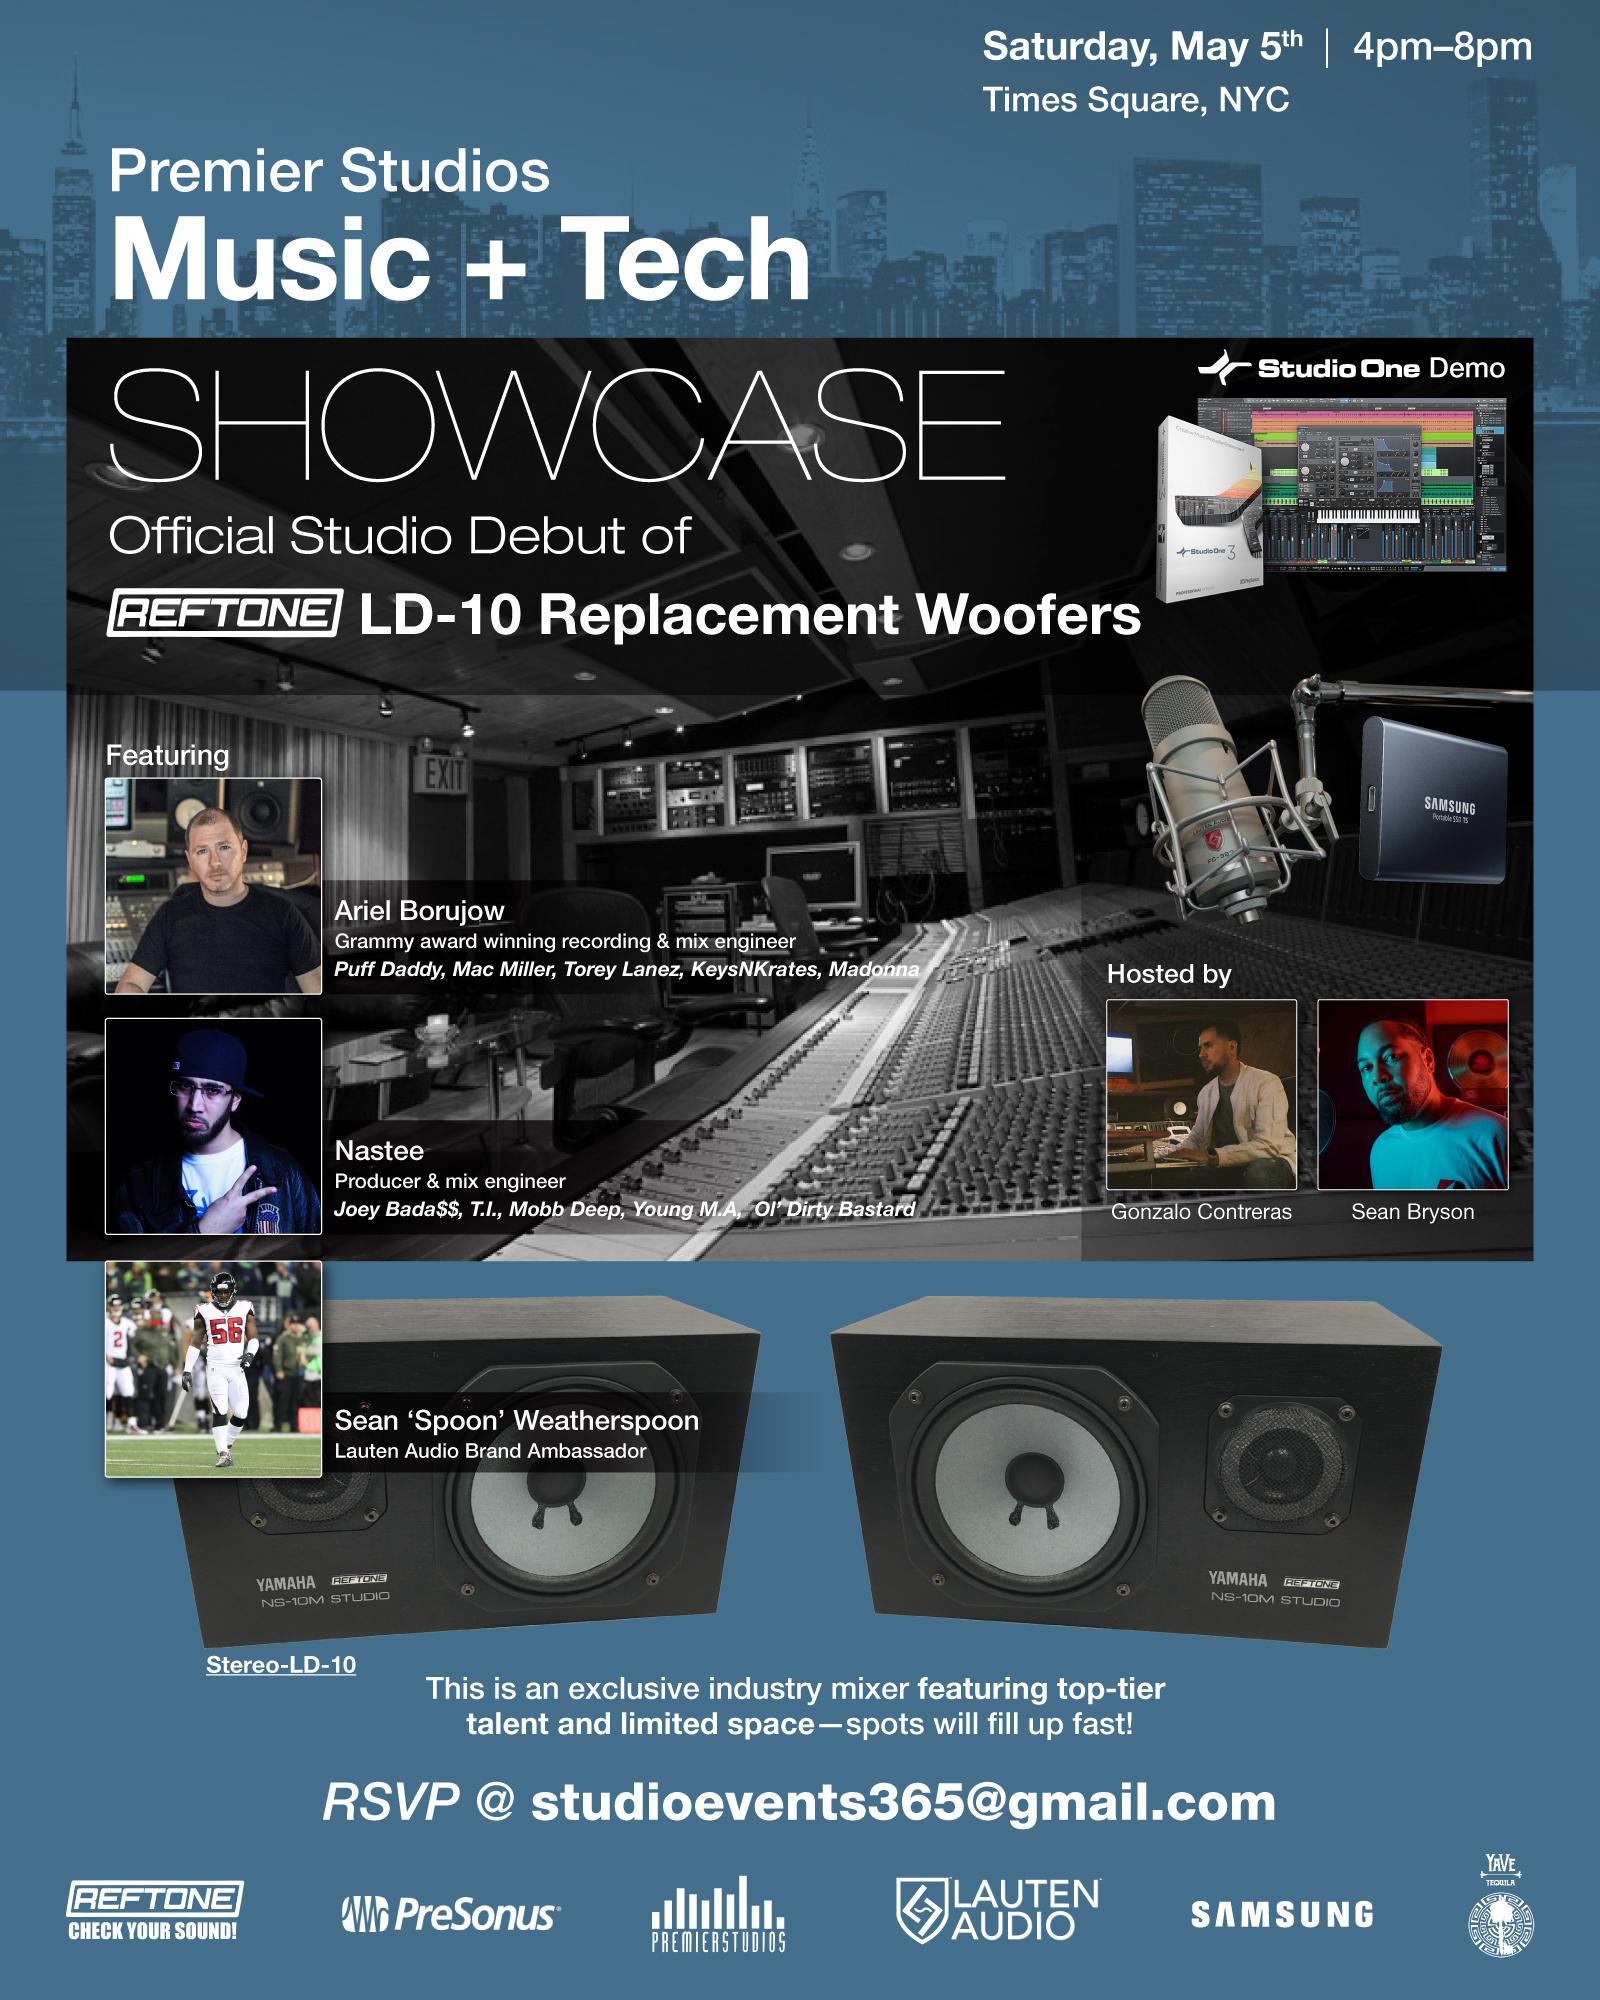 Music + Tech Showcase NYC - Reftone